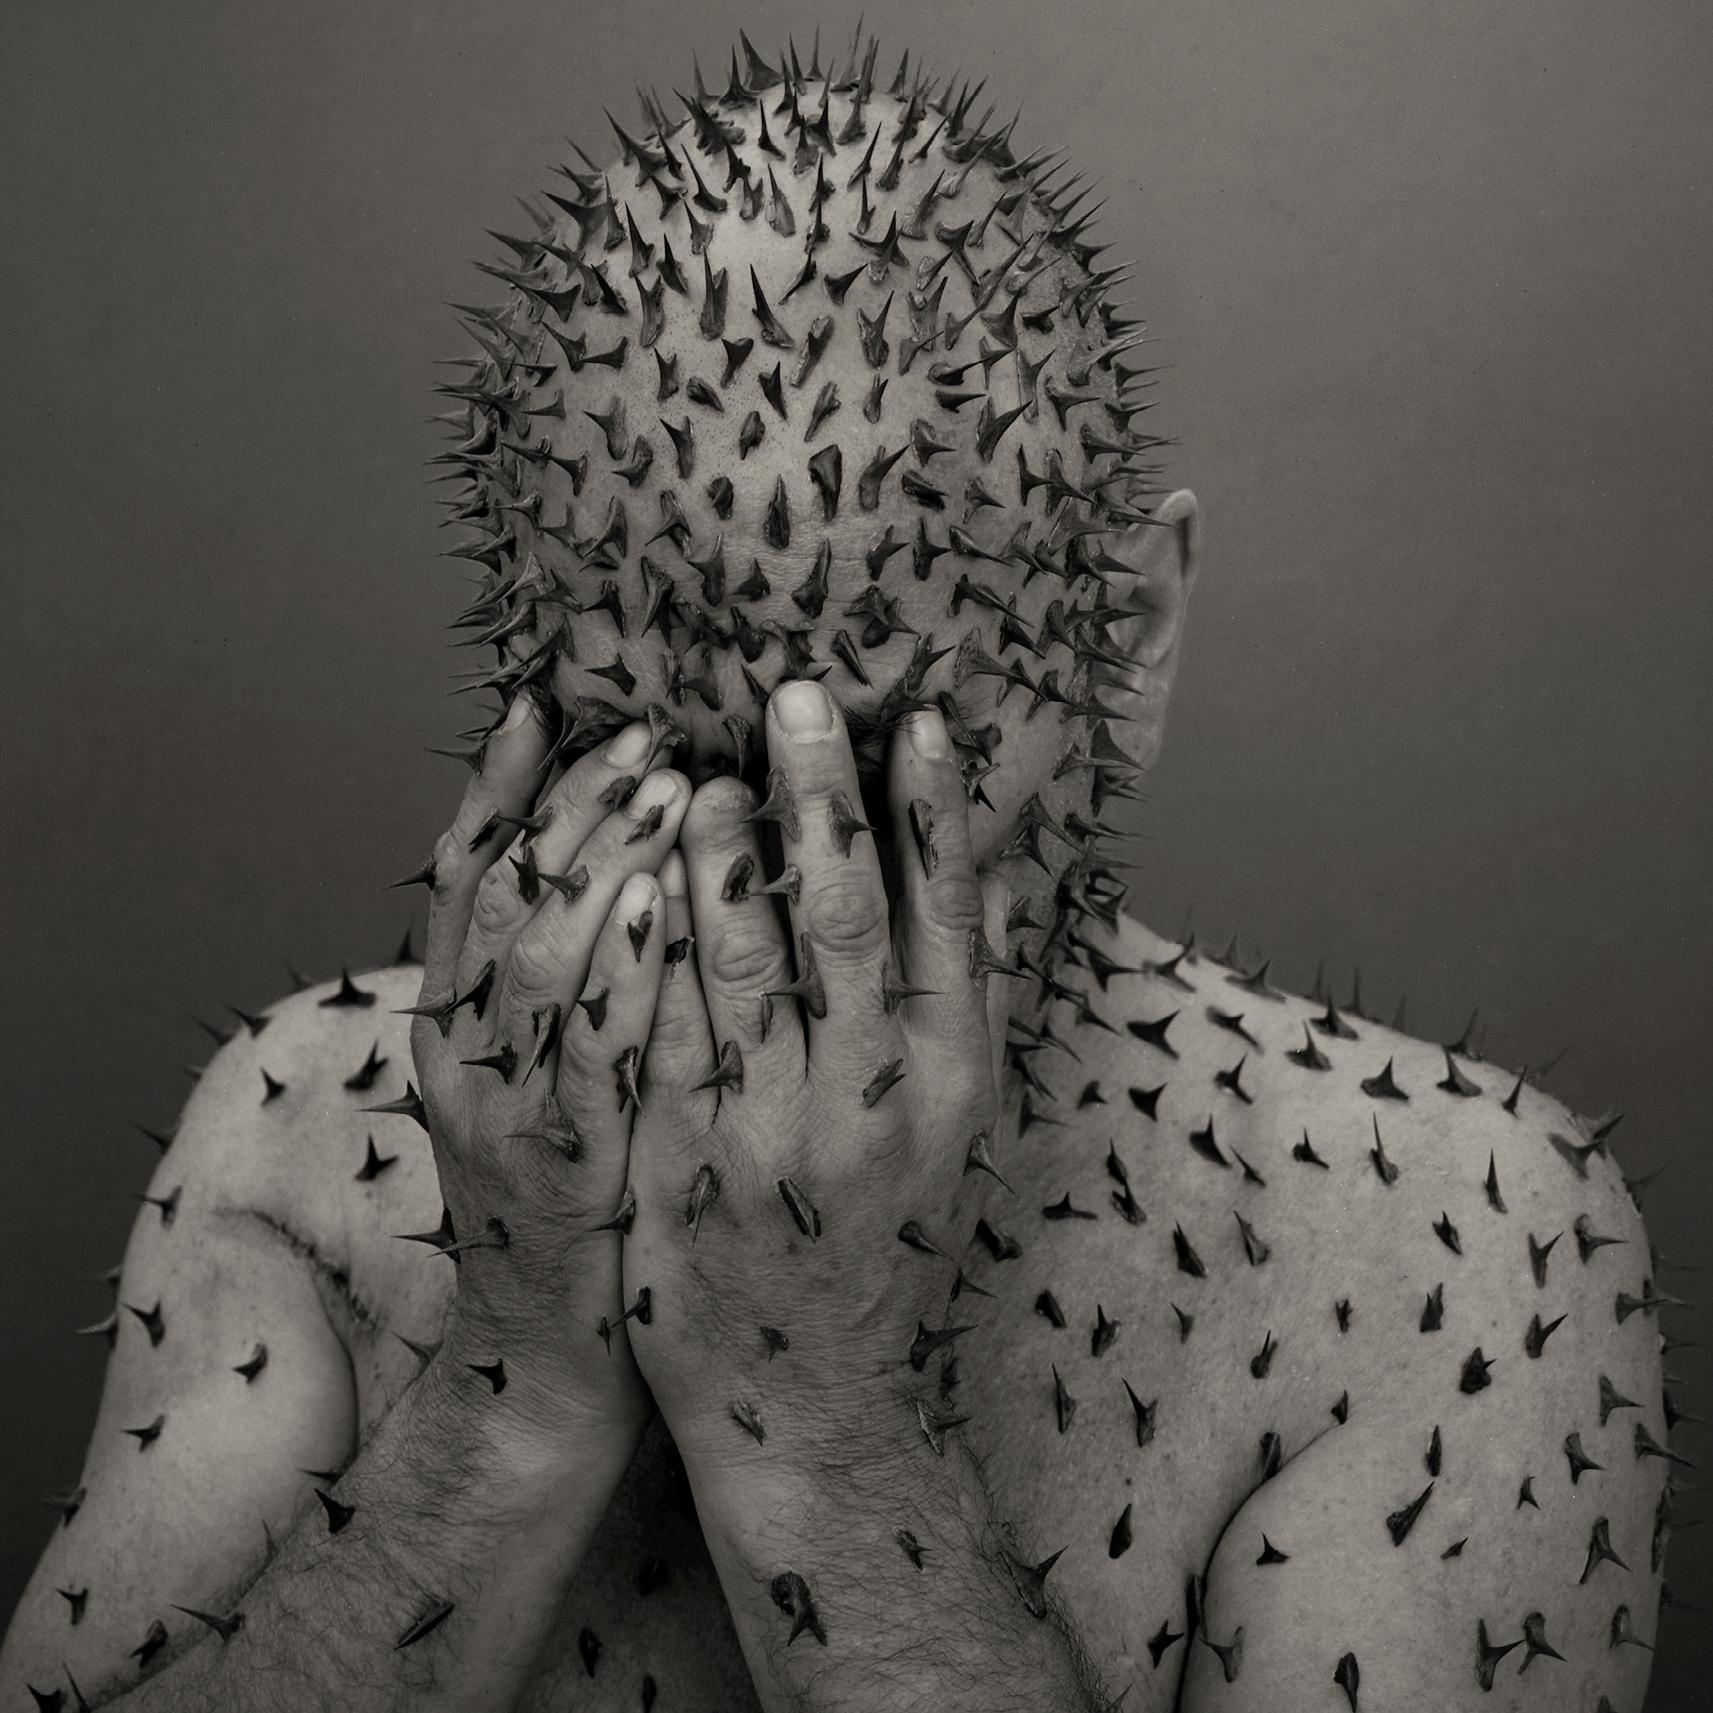 Roberto Kusterle – Metamorphosis